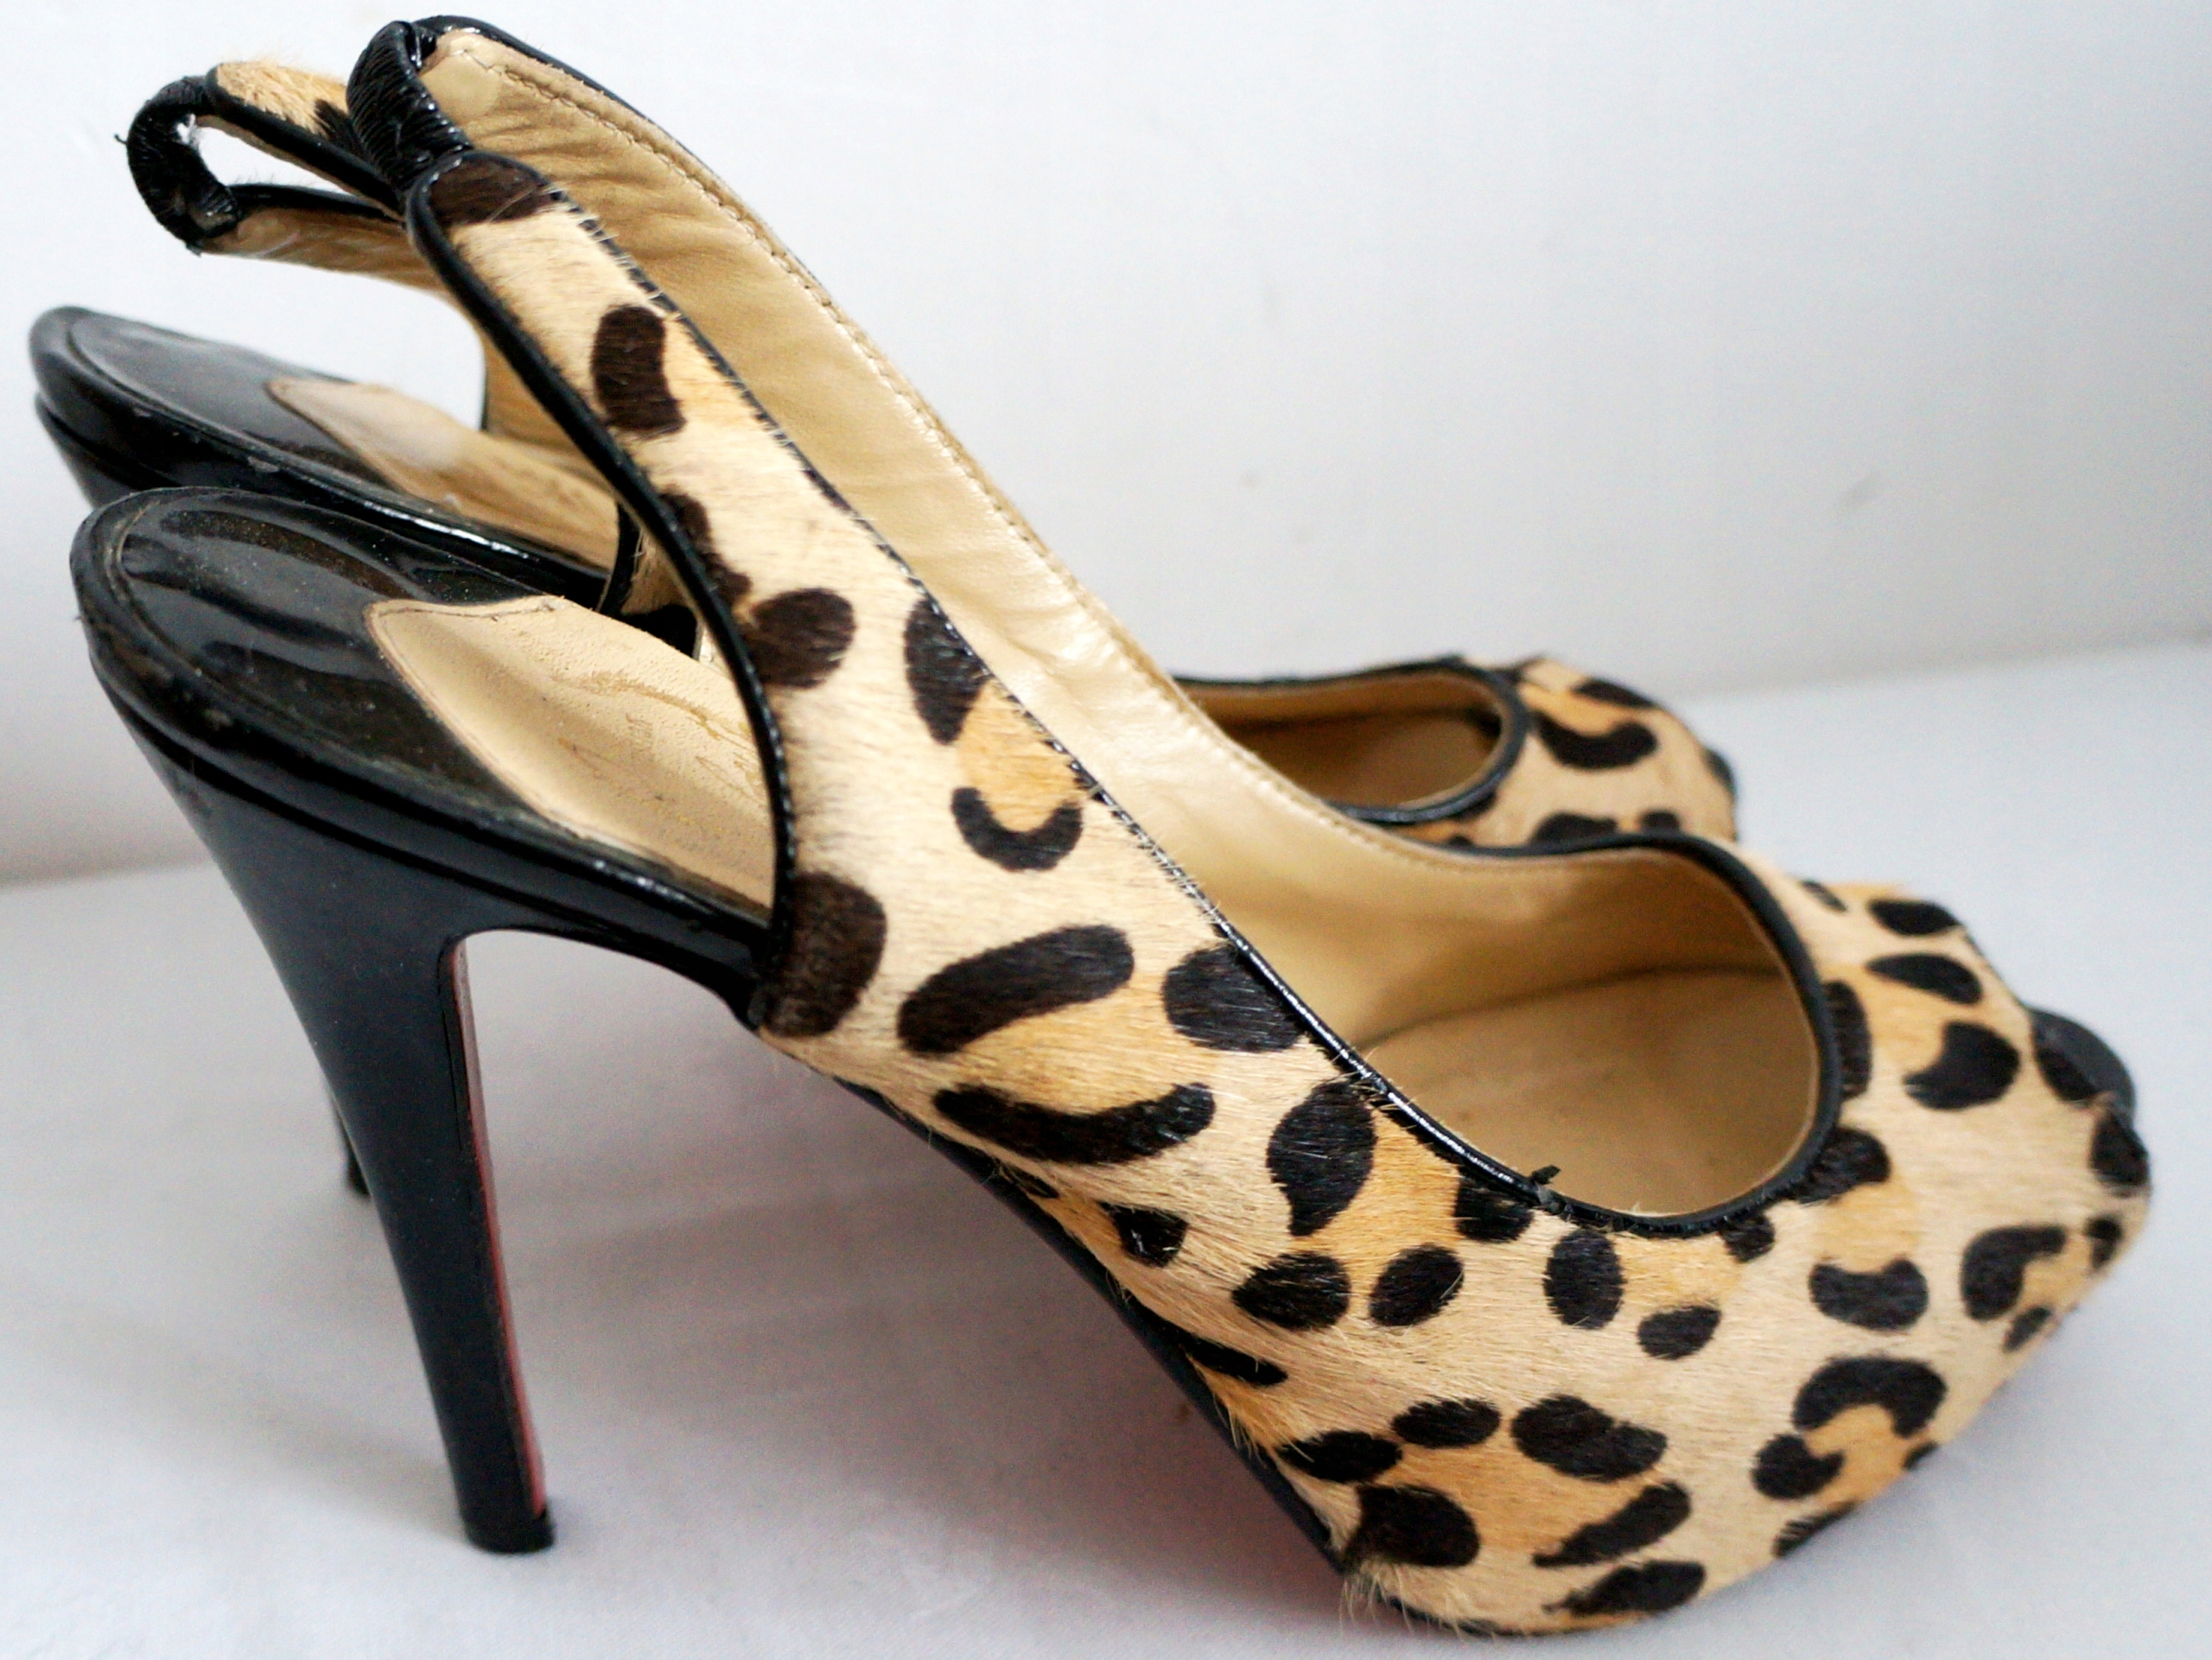 87e73e793540e buty kolce?brand=christian louboutin w Oficjalnym Archiwum Allegro - archiwum  ofert